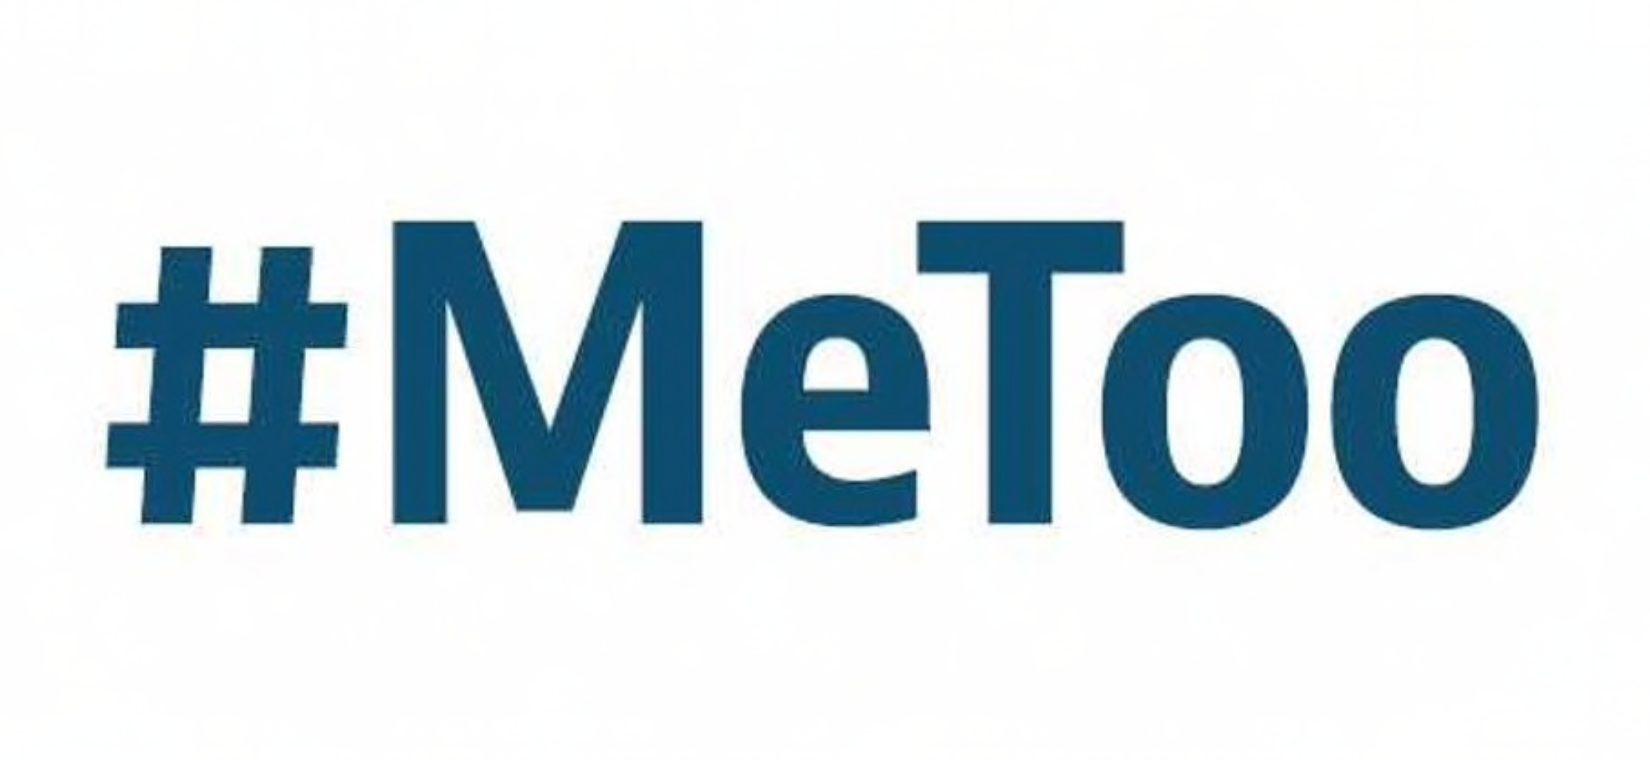 me too campaign - 960×540